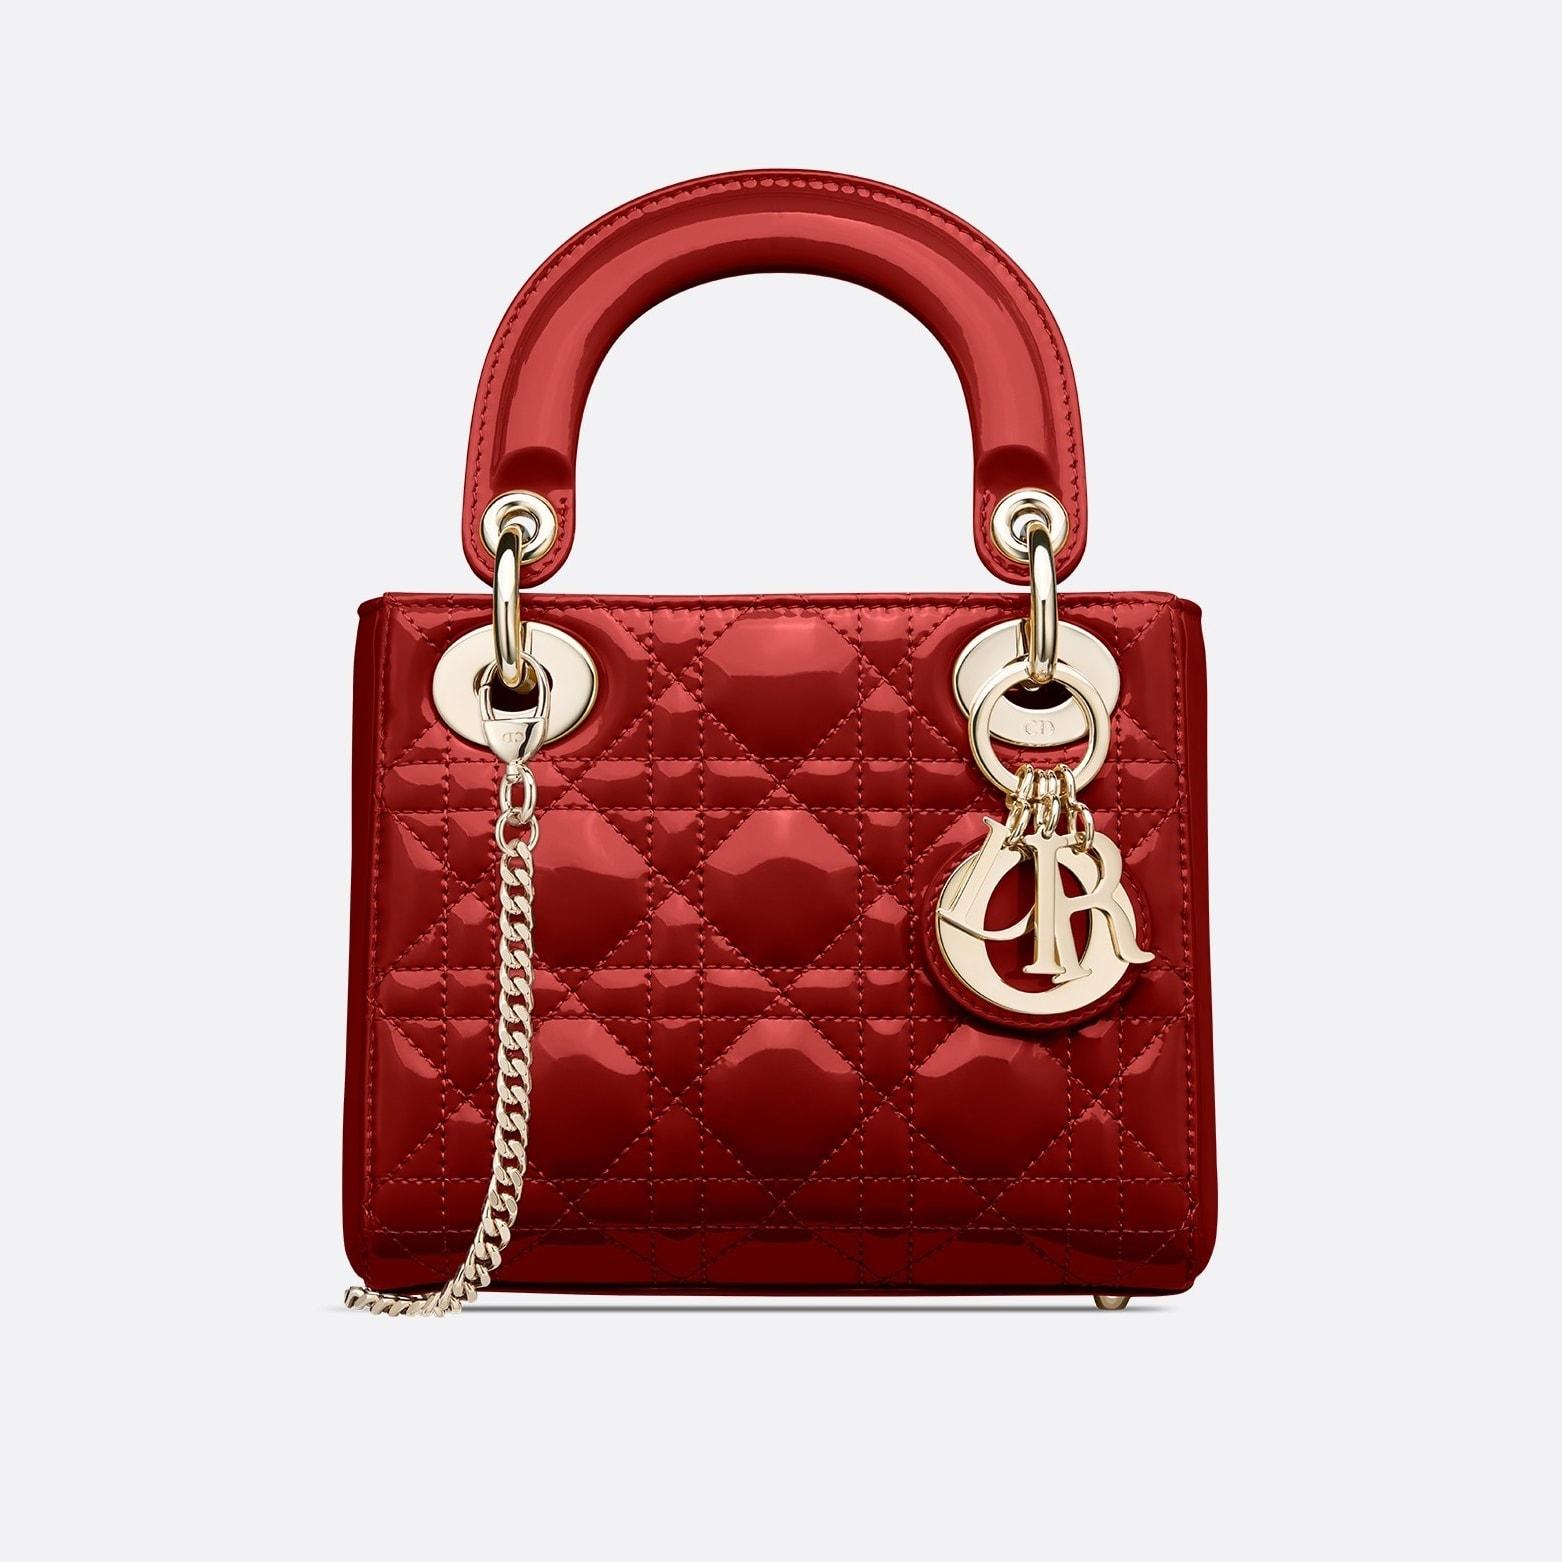 Dior-Lady-Dior-Mini-Bag